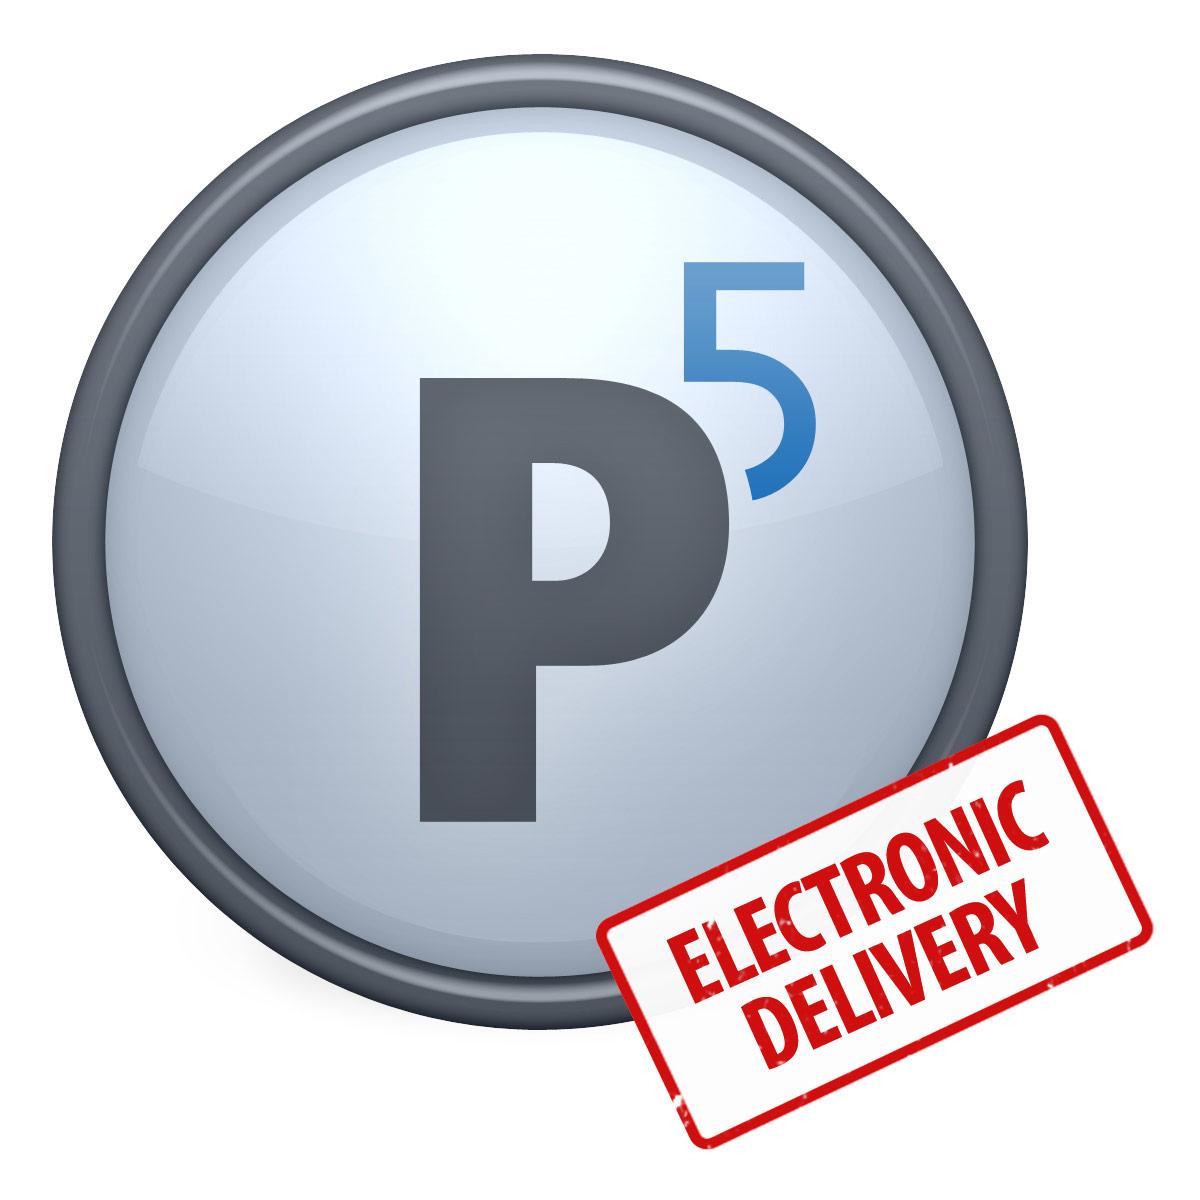 Archiware P5 Desktop Edition License